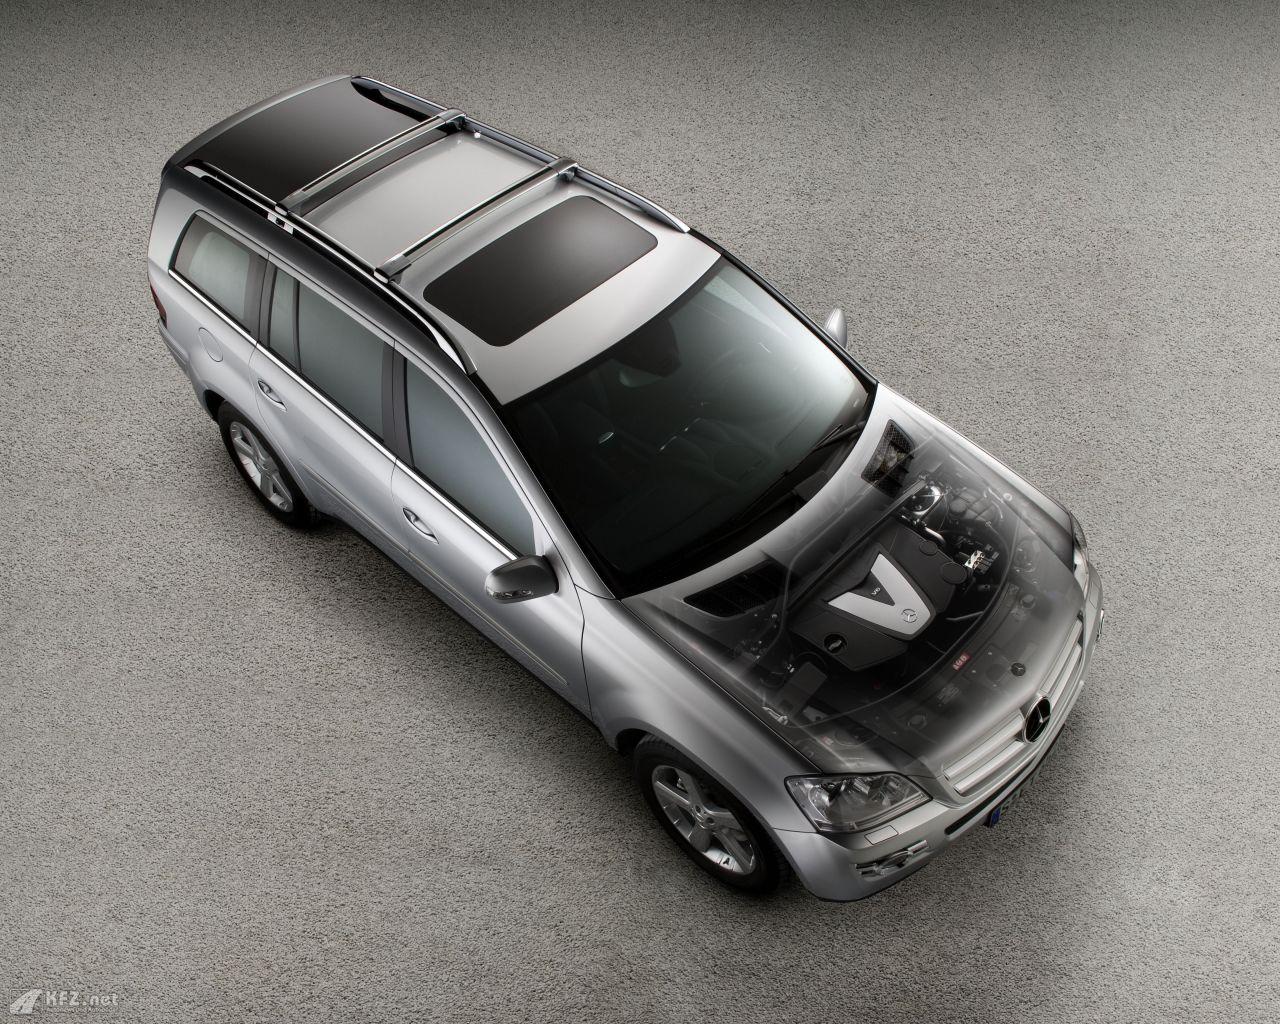 mercedes-gl-klasse-1280x1024-16